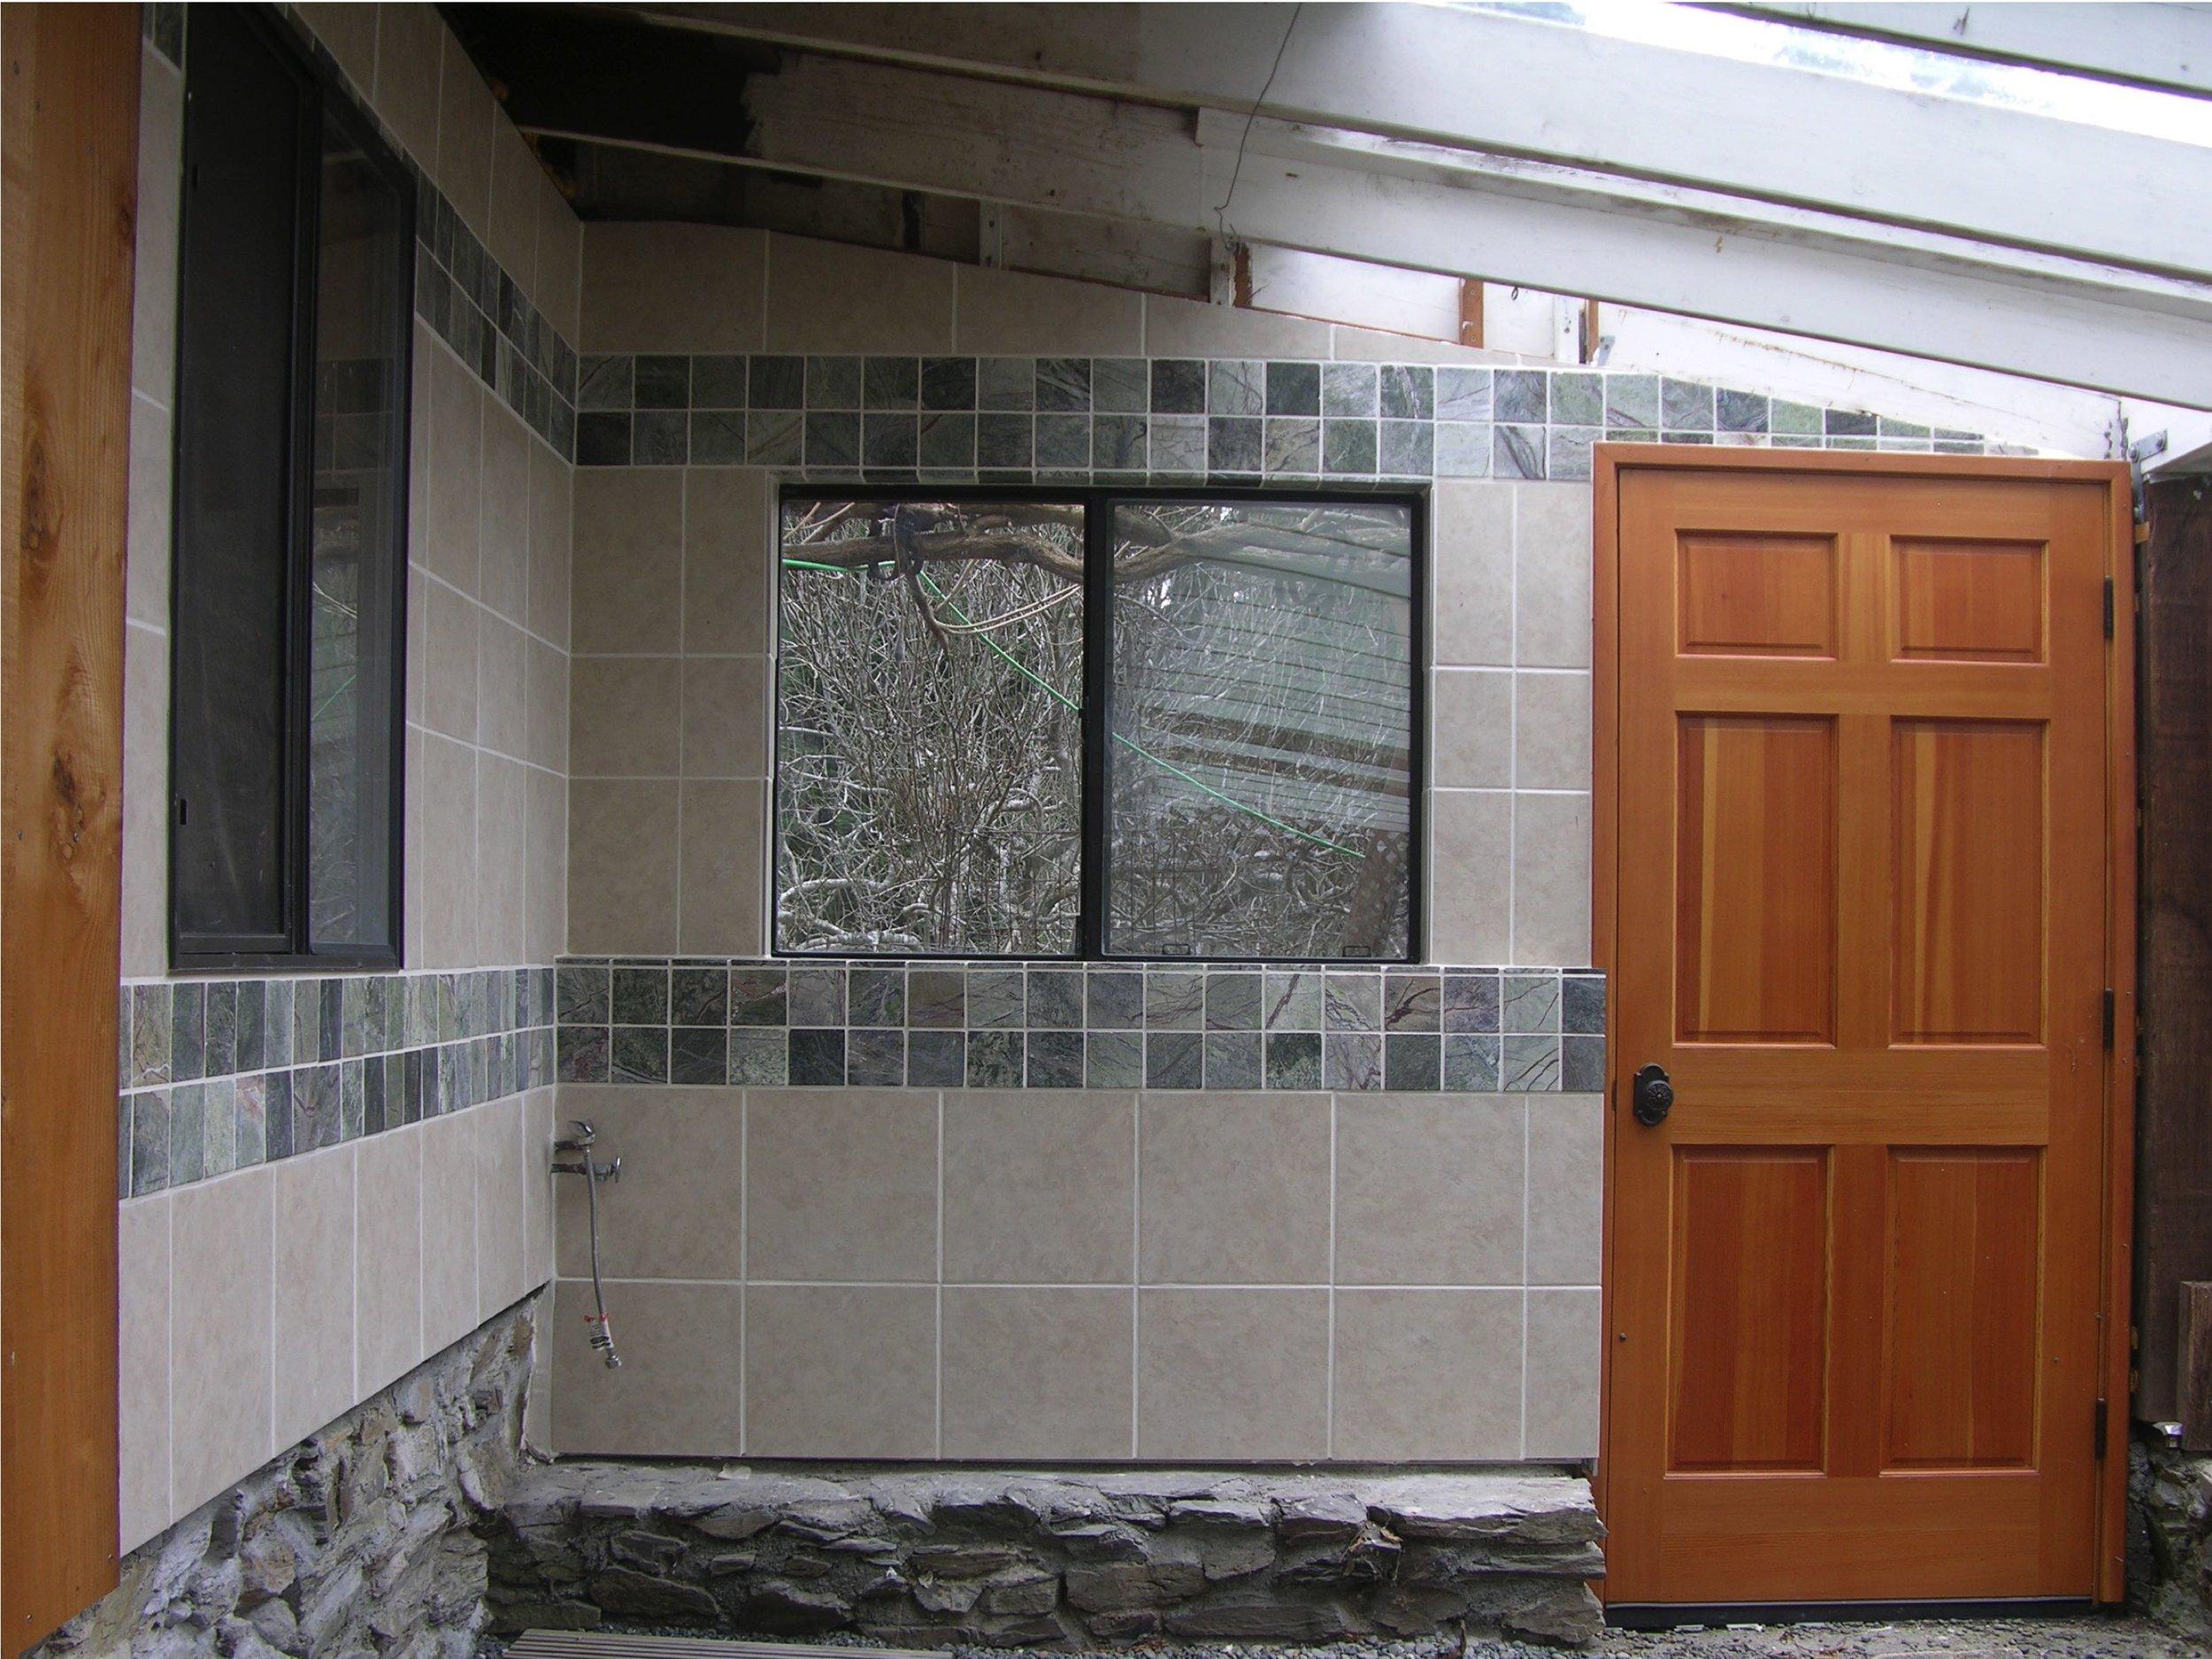 Shower Overview.jpg